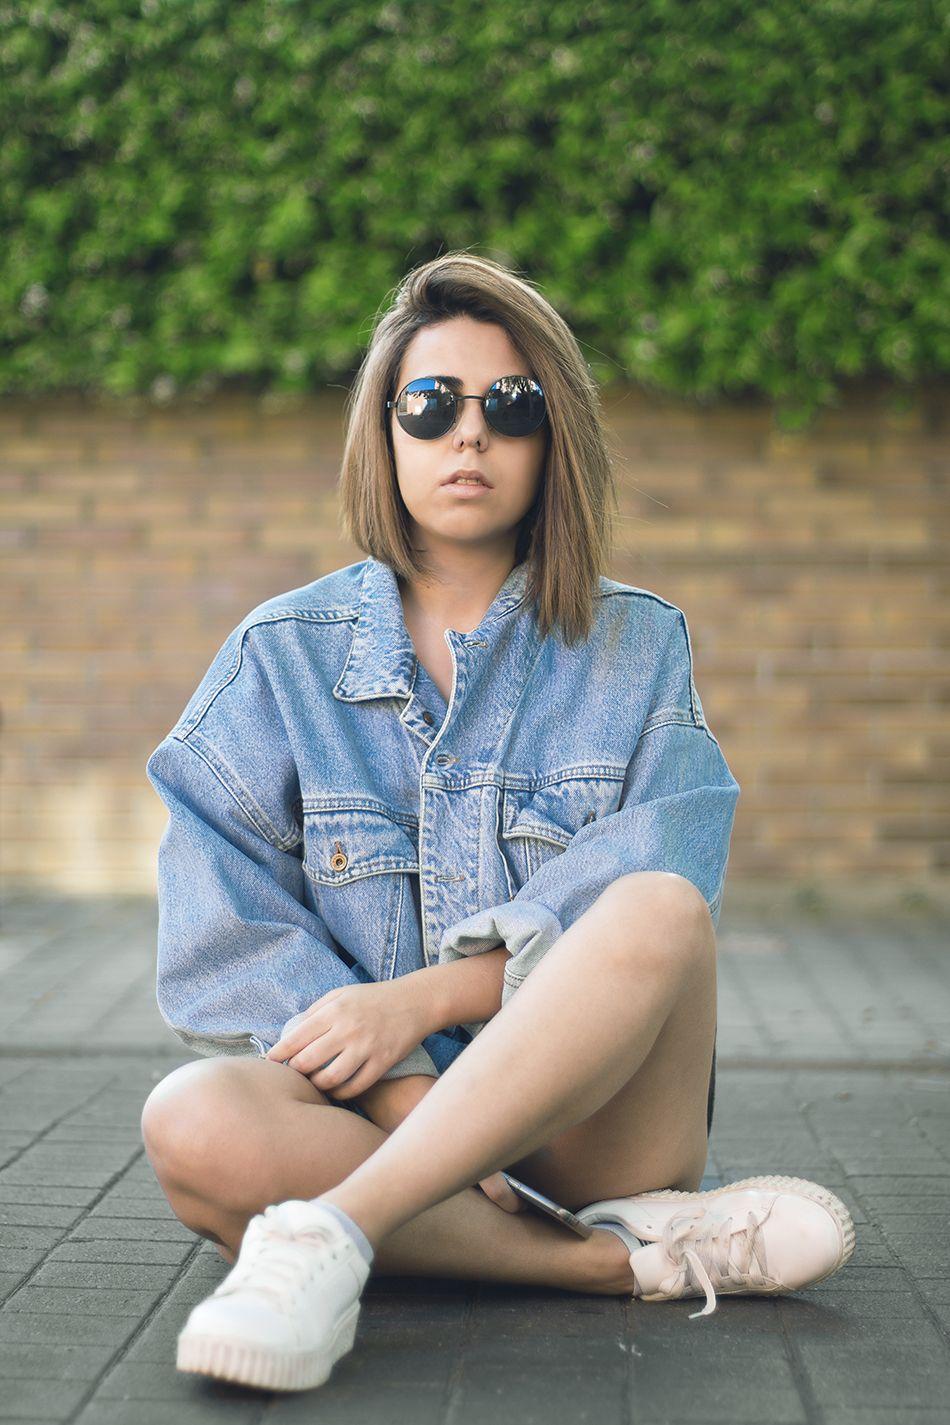 Instagram Instagramer Girl Denim Jacket Levis Tumblr Pic Picture